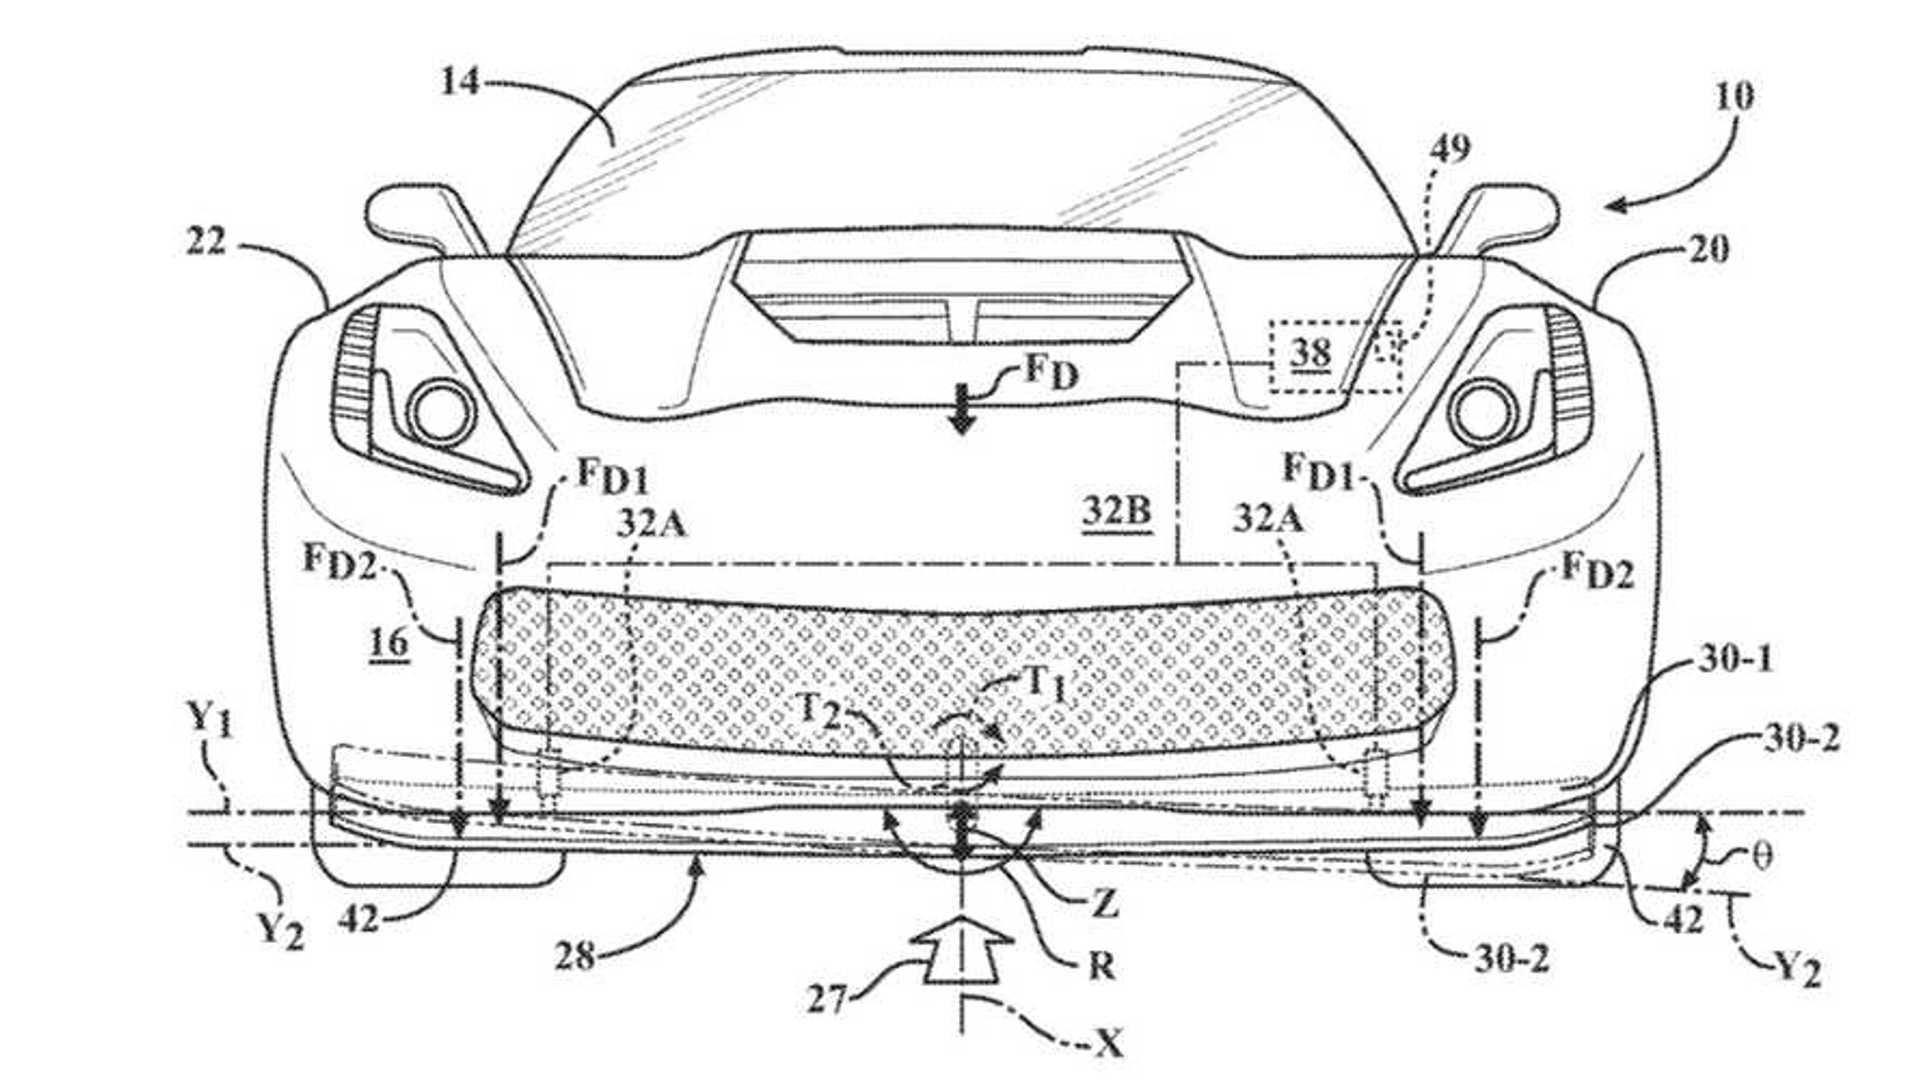 https://cdn.motor1.com/images/mgl/2kjZE/s1/general-motors-front-active-aero-patent.jpg